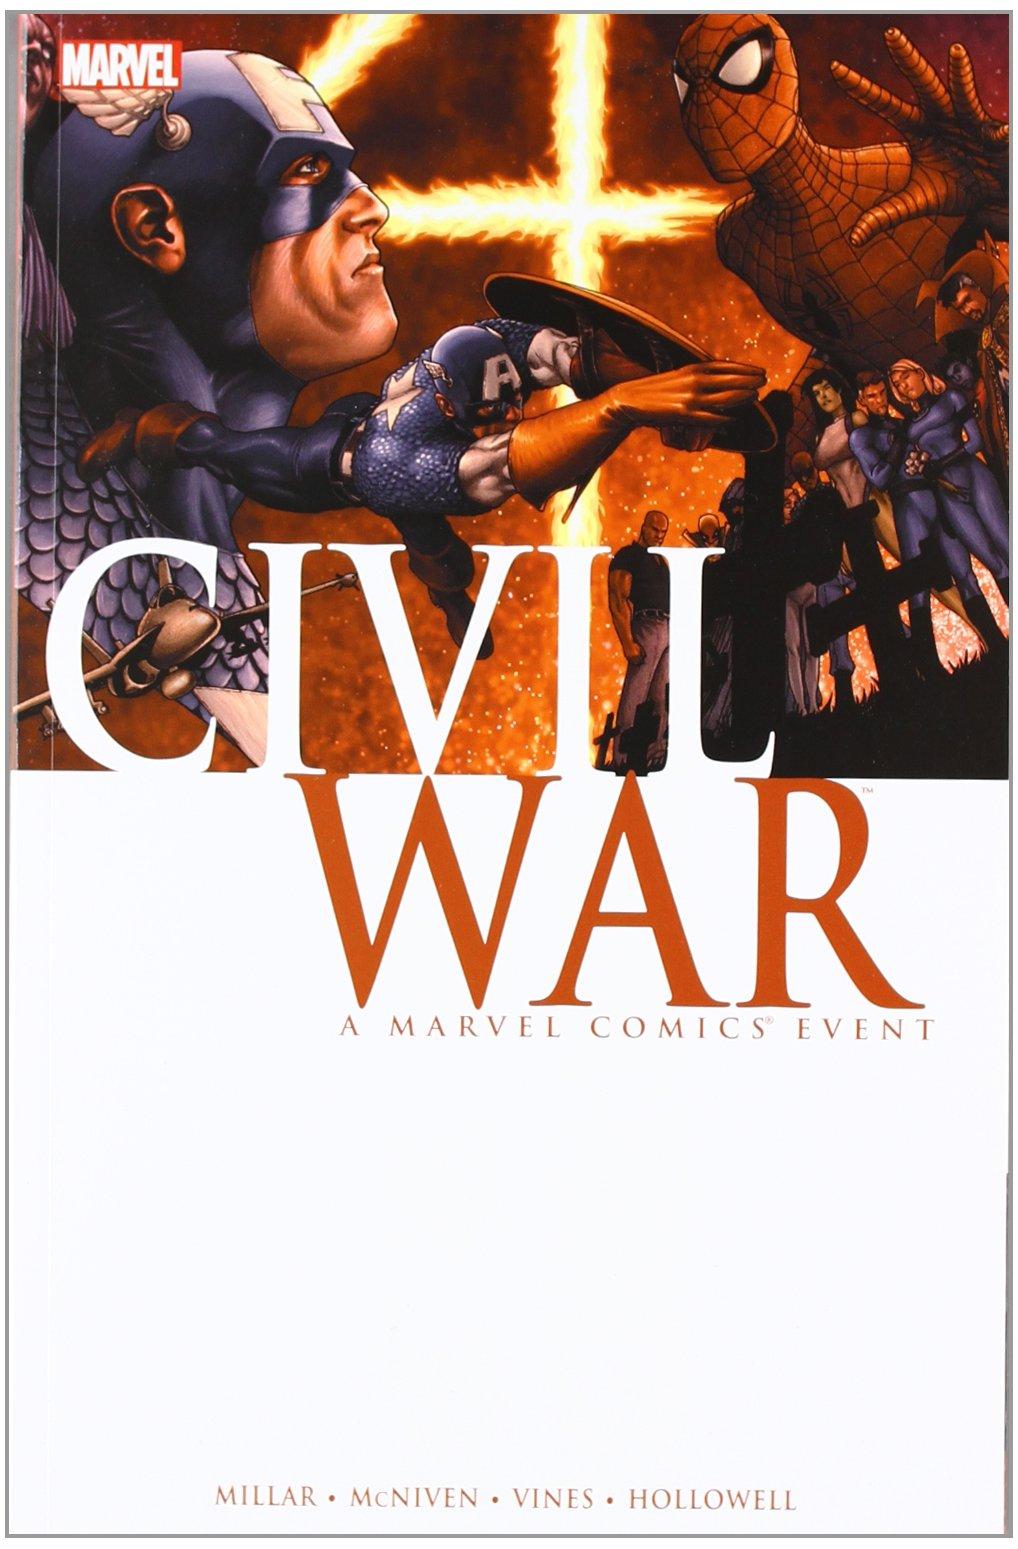 Civil War ISBN-13 9780785121794